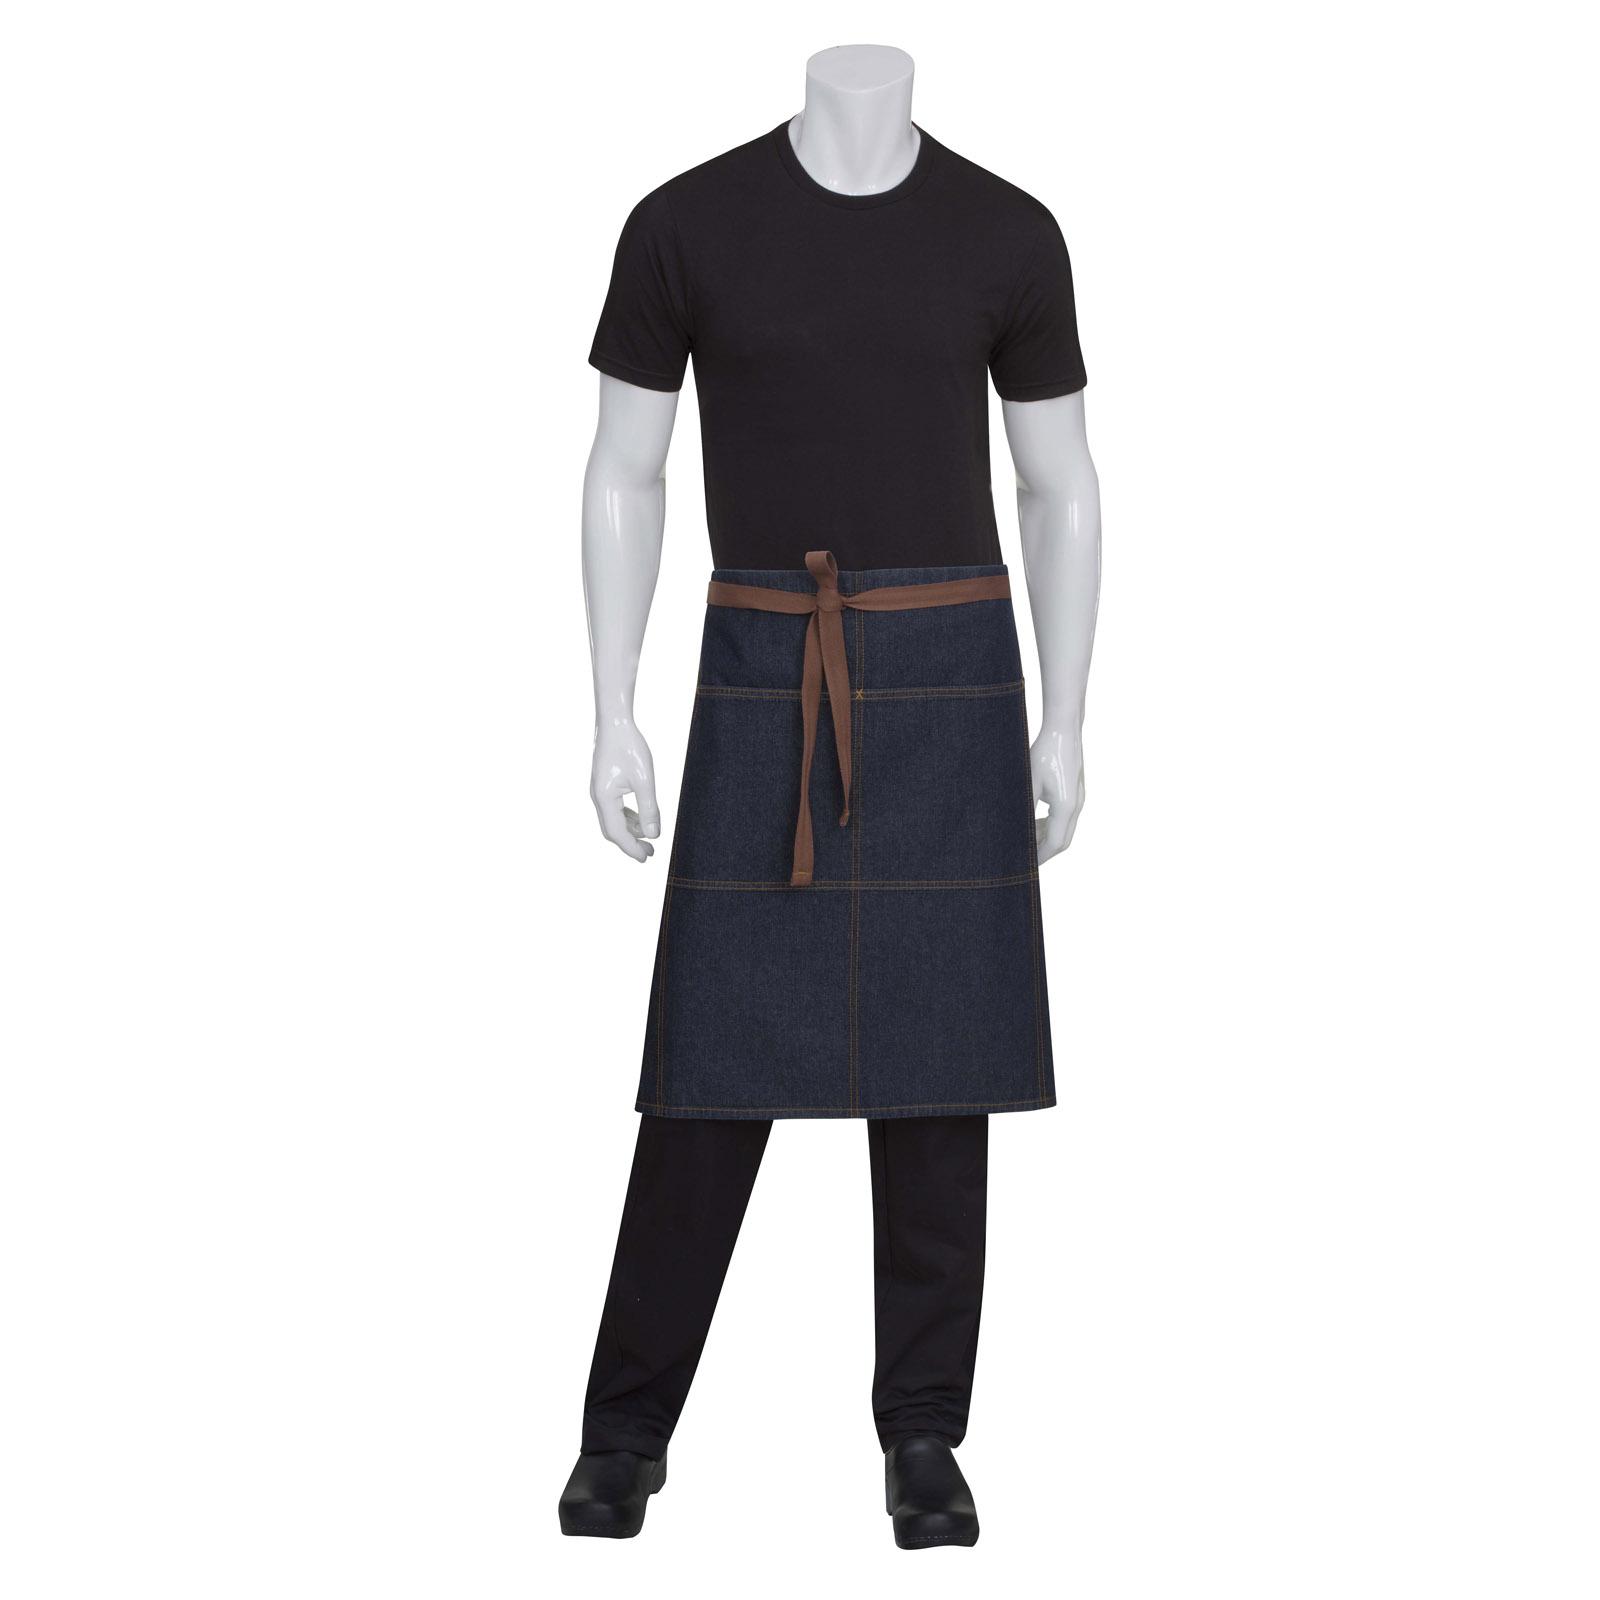 Chef Works AW049IBL0 waist apron